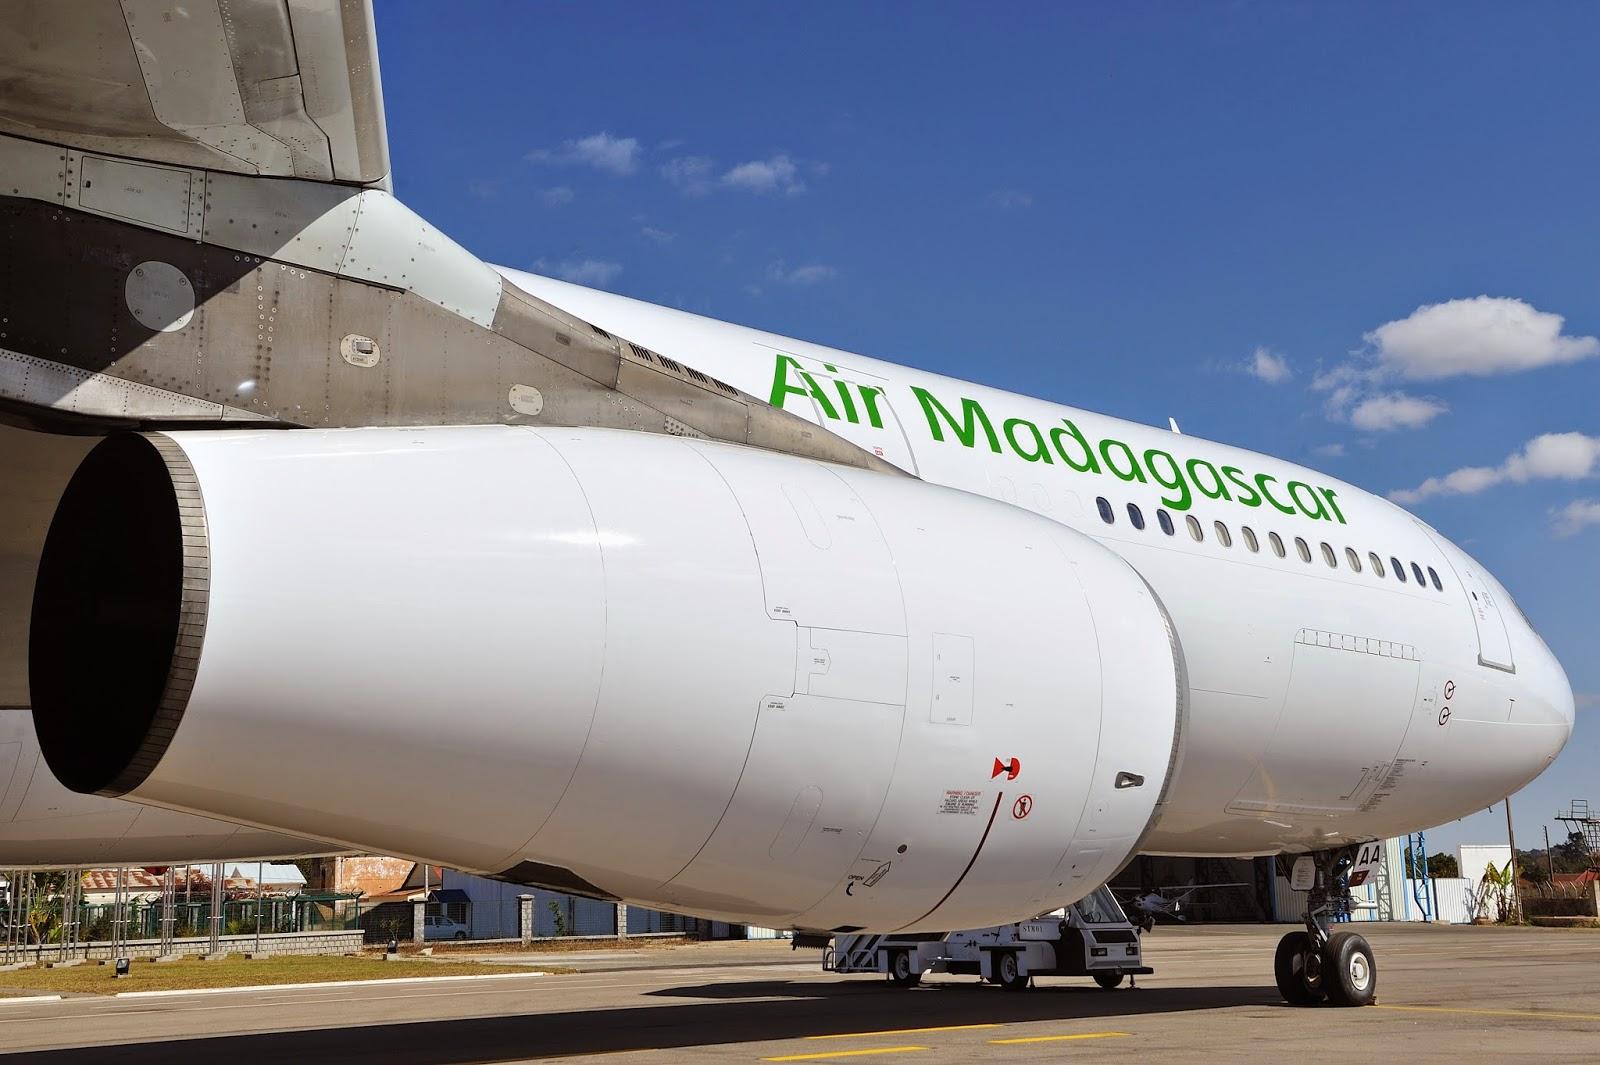 Suspension des vols Air Madagascar entre CDG et Madagascar